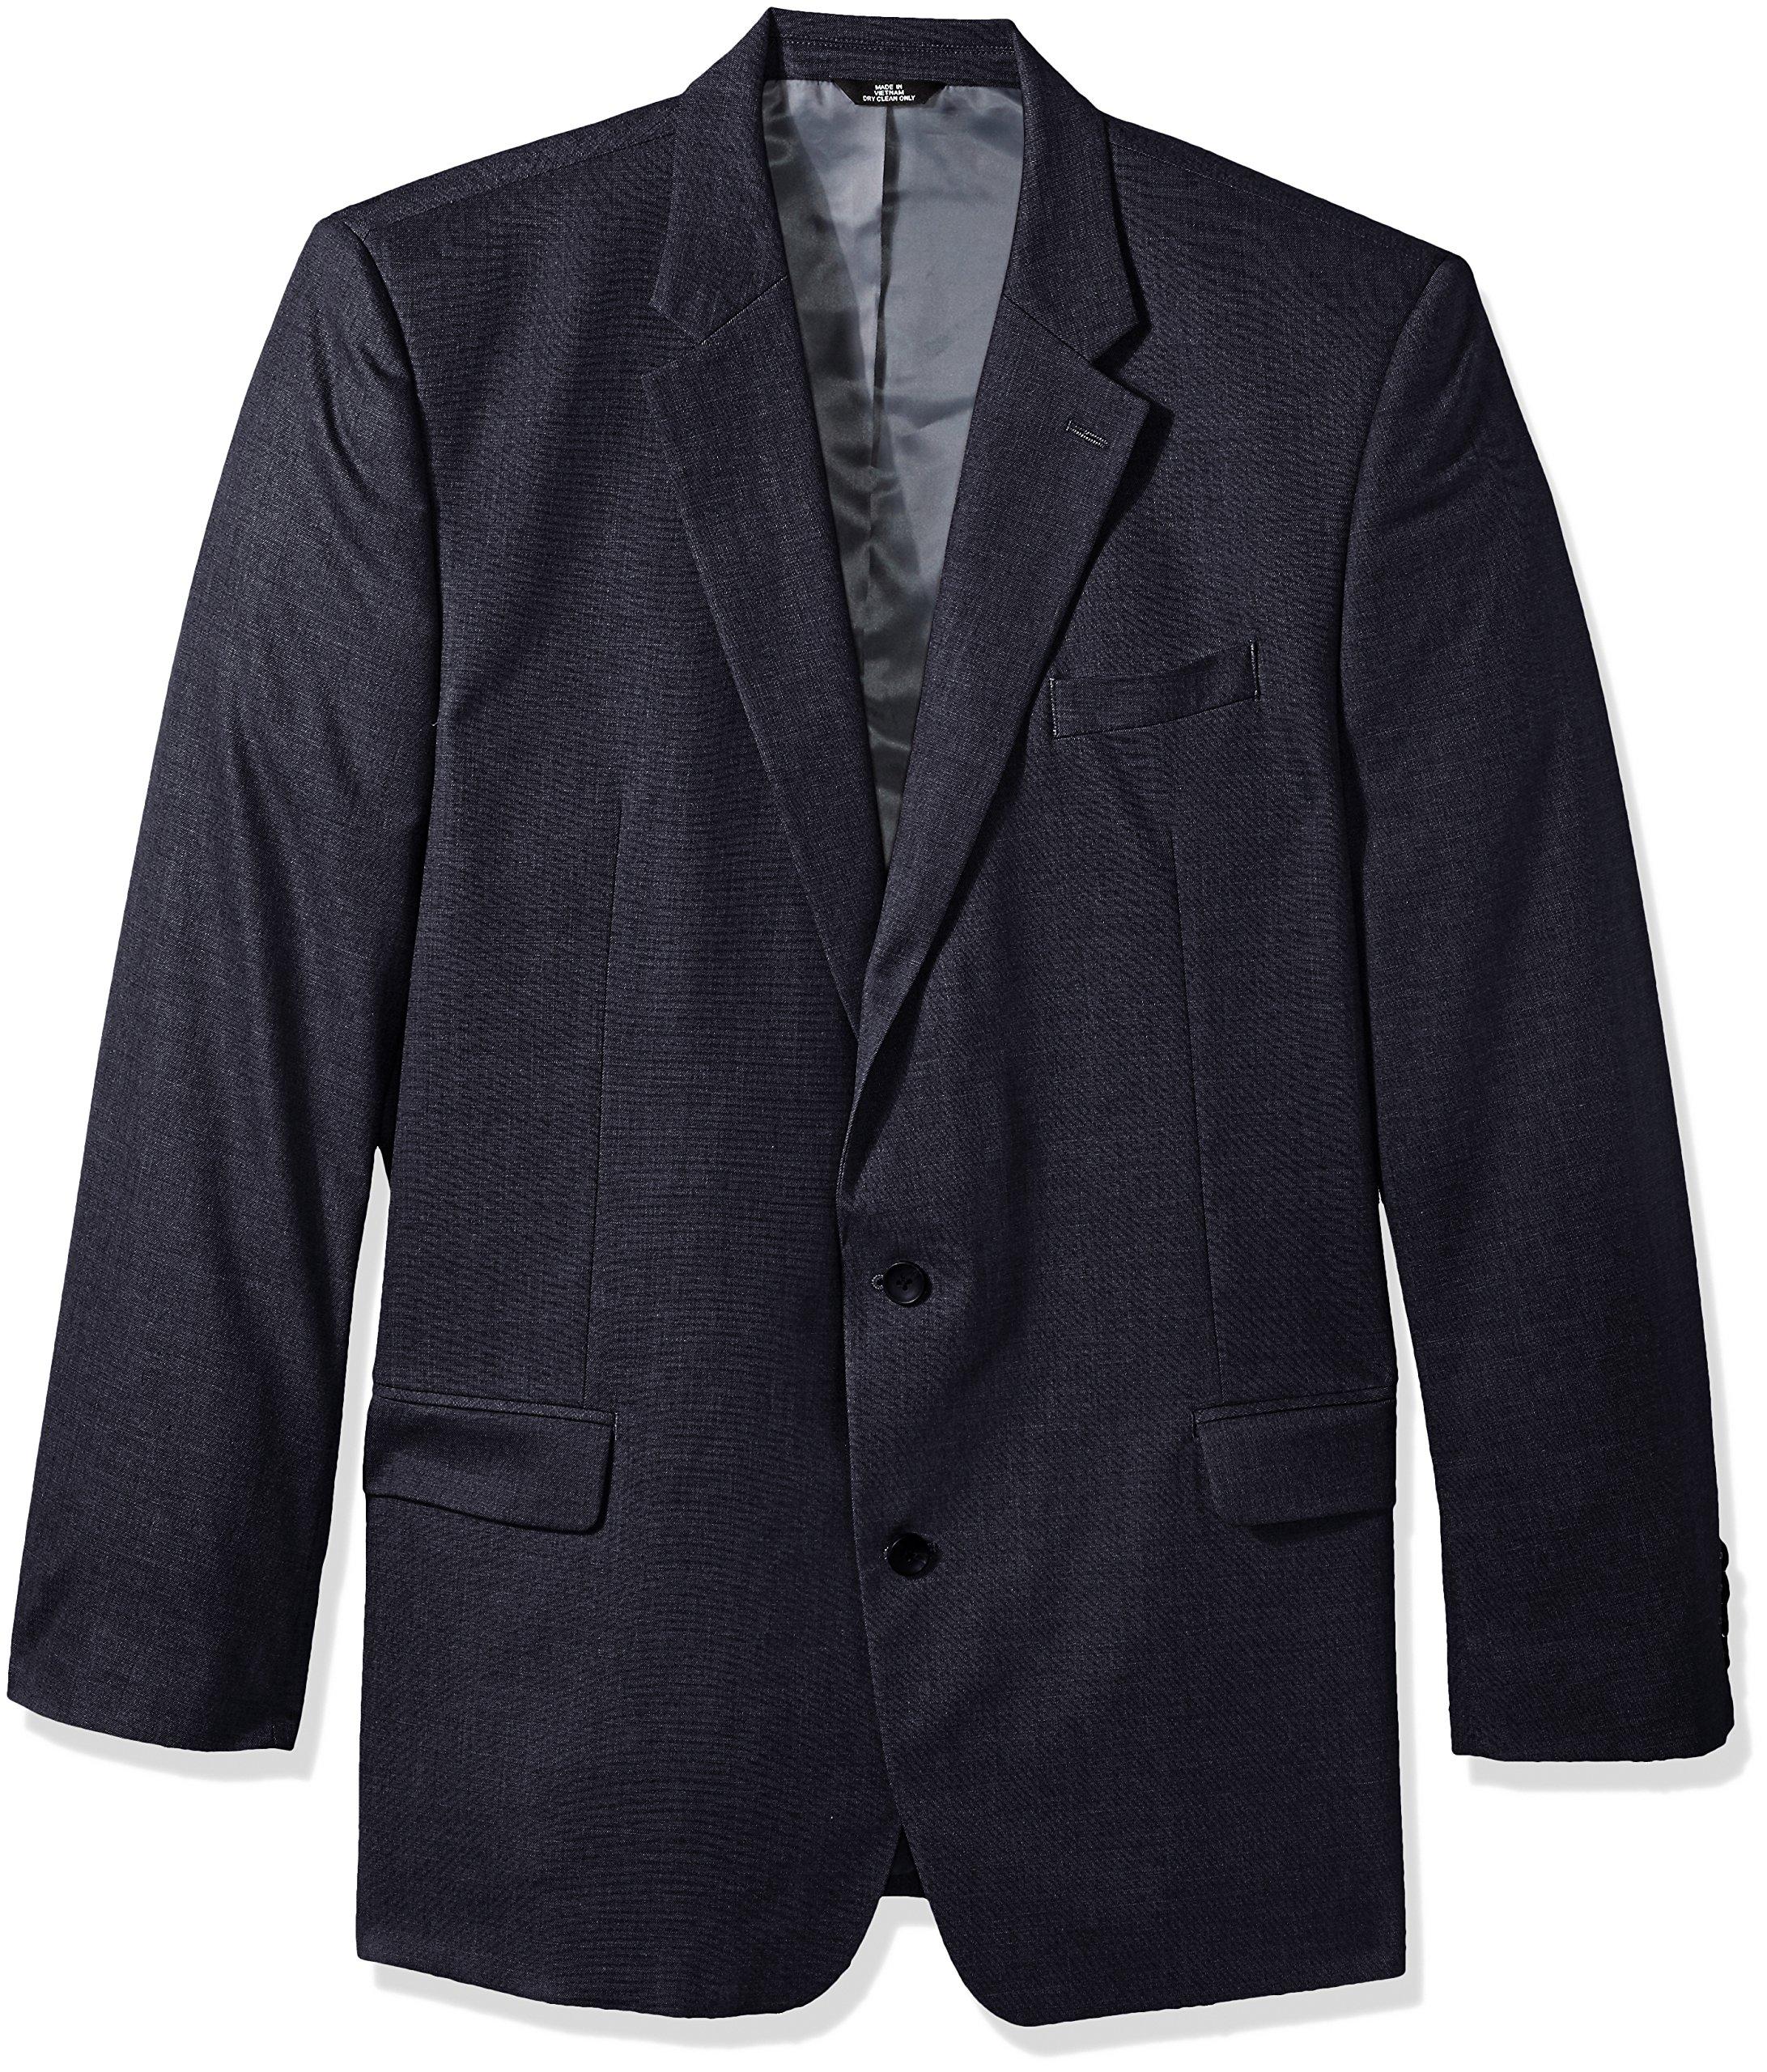 Haggar Men's Tall Size J.M. Premium Performance Stretch Stria 2-Button Suit Separate Coat, Dark Navy, 50XL